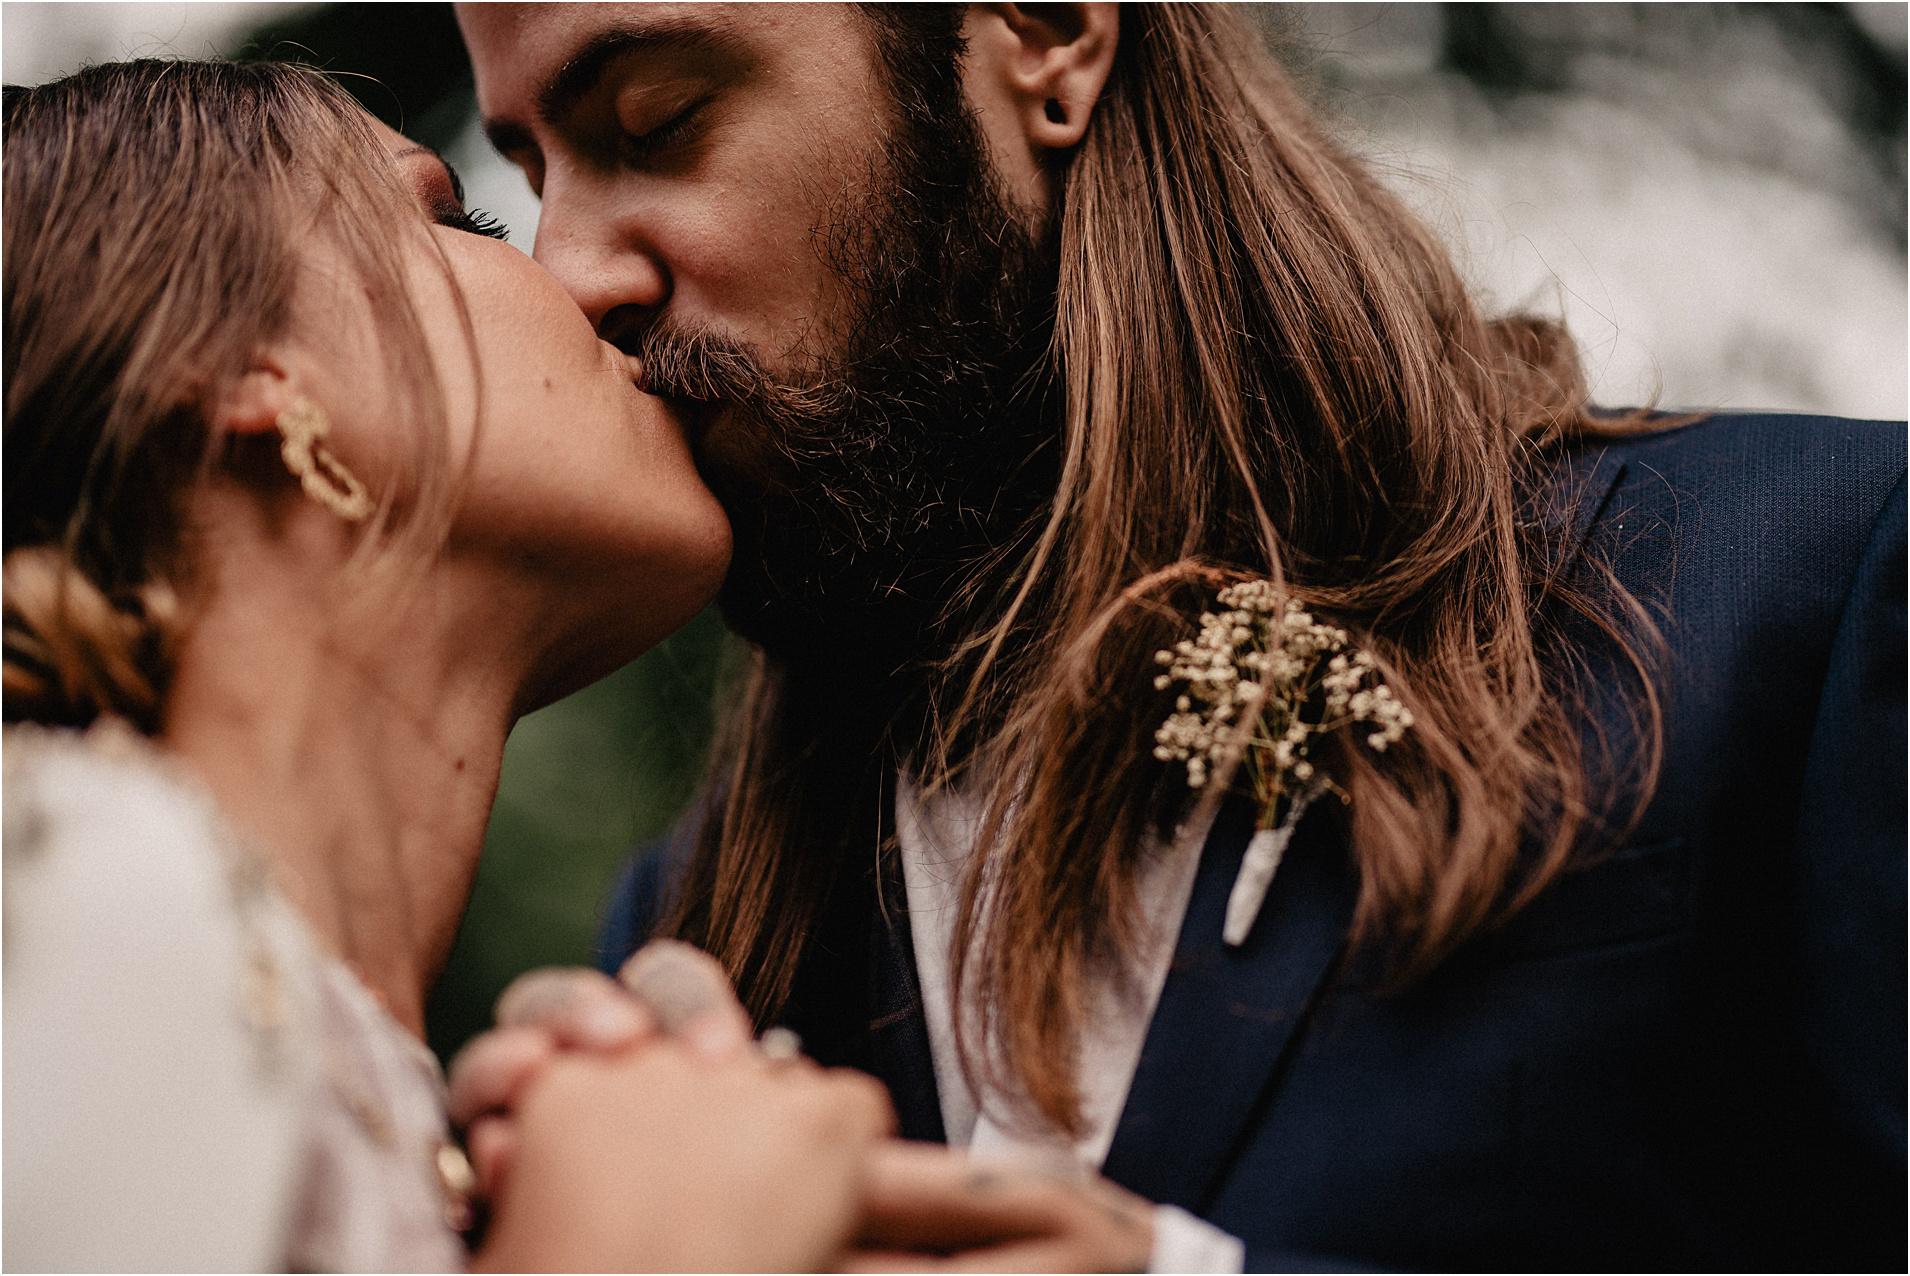 Fotografía y video en Palacio de Arbaisenea Bodas San Sebastián Donostia Guipuzcoa - Finca Arbaisenea by Maher Catering Wedding films and photography-44.jpg